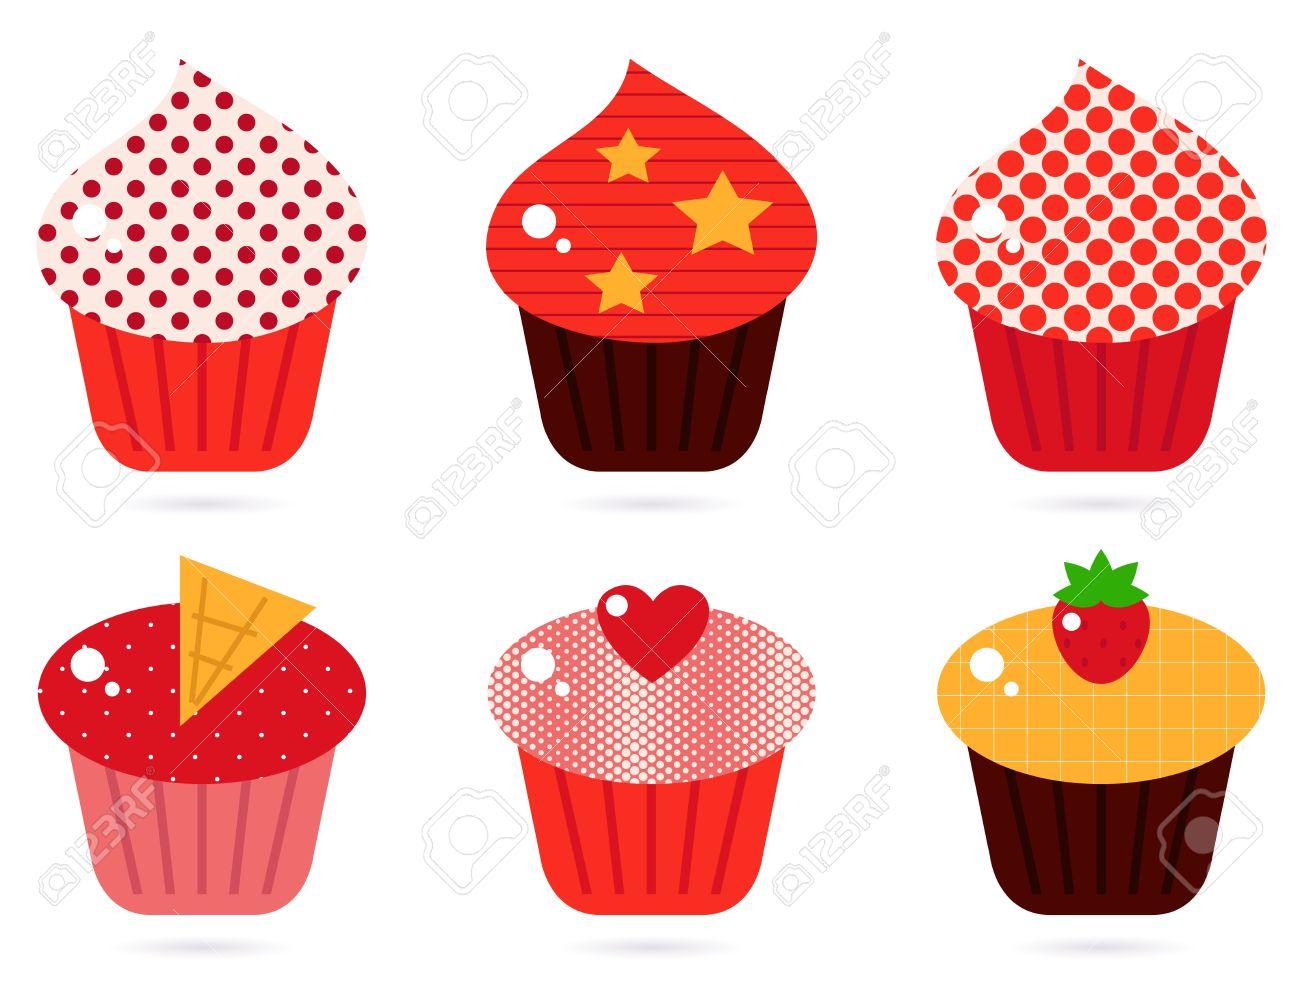 Cupcakes Colección De Iconos Vector De Dibujos Animados